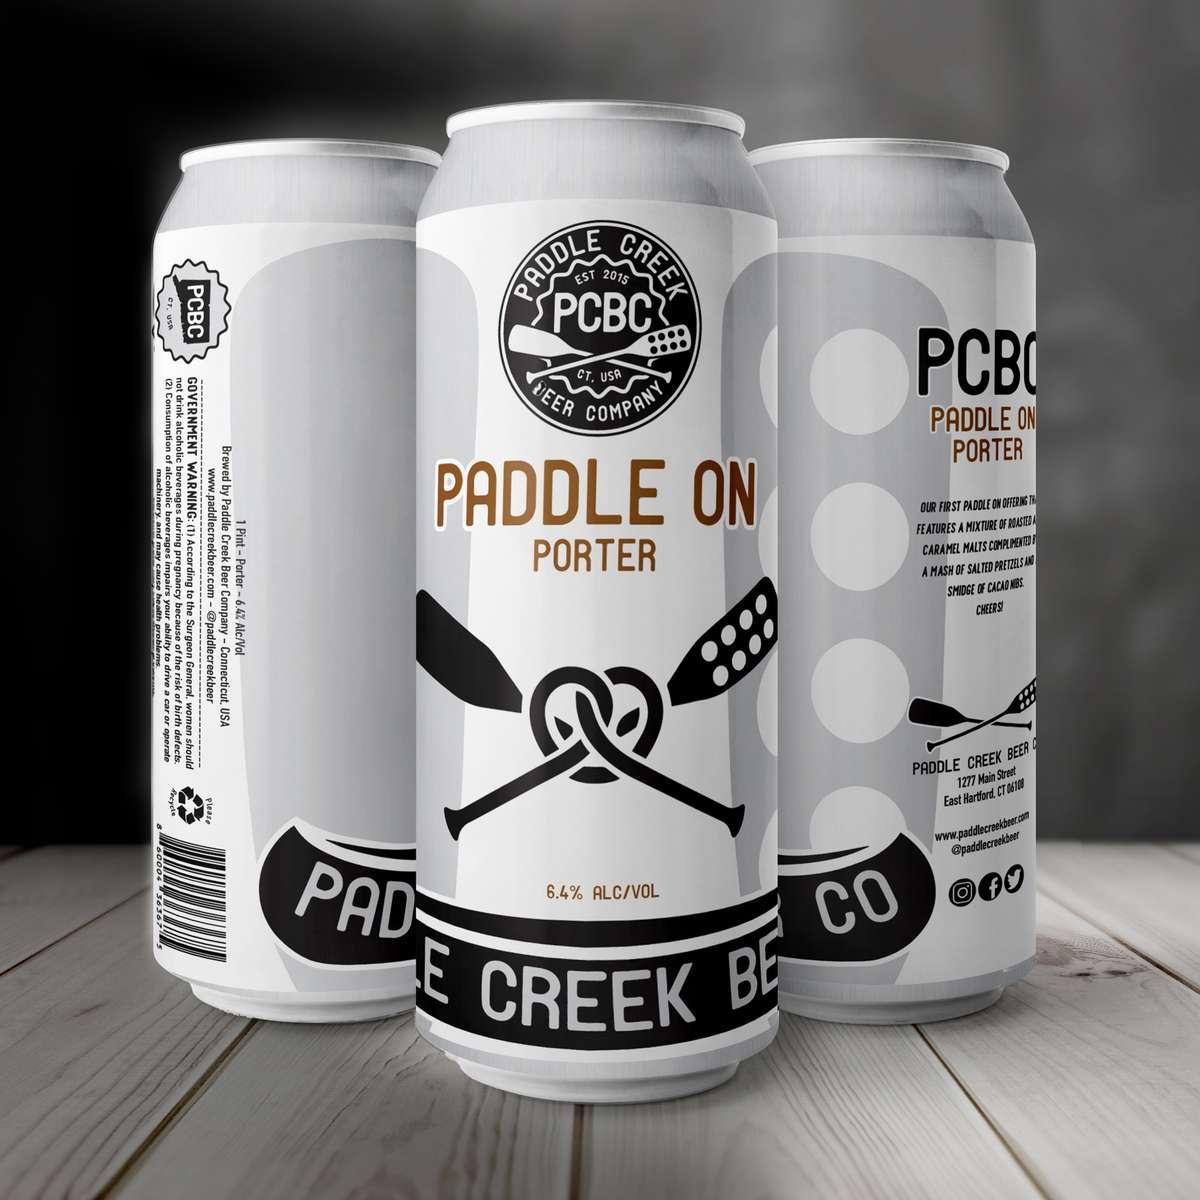 Paddle On Porter